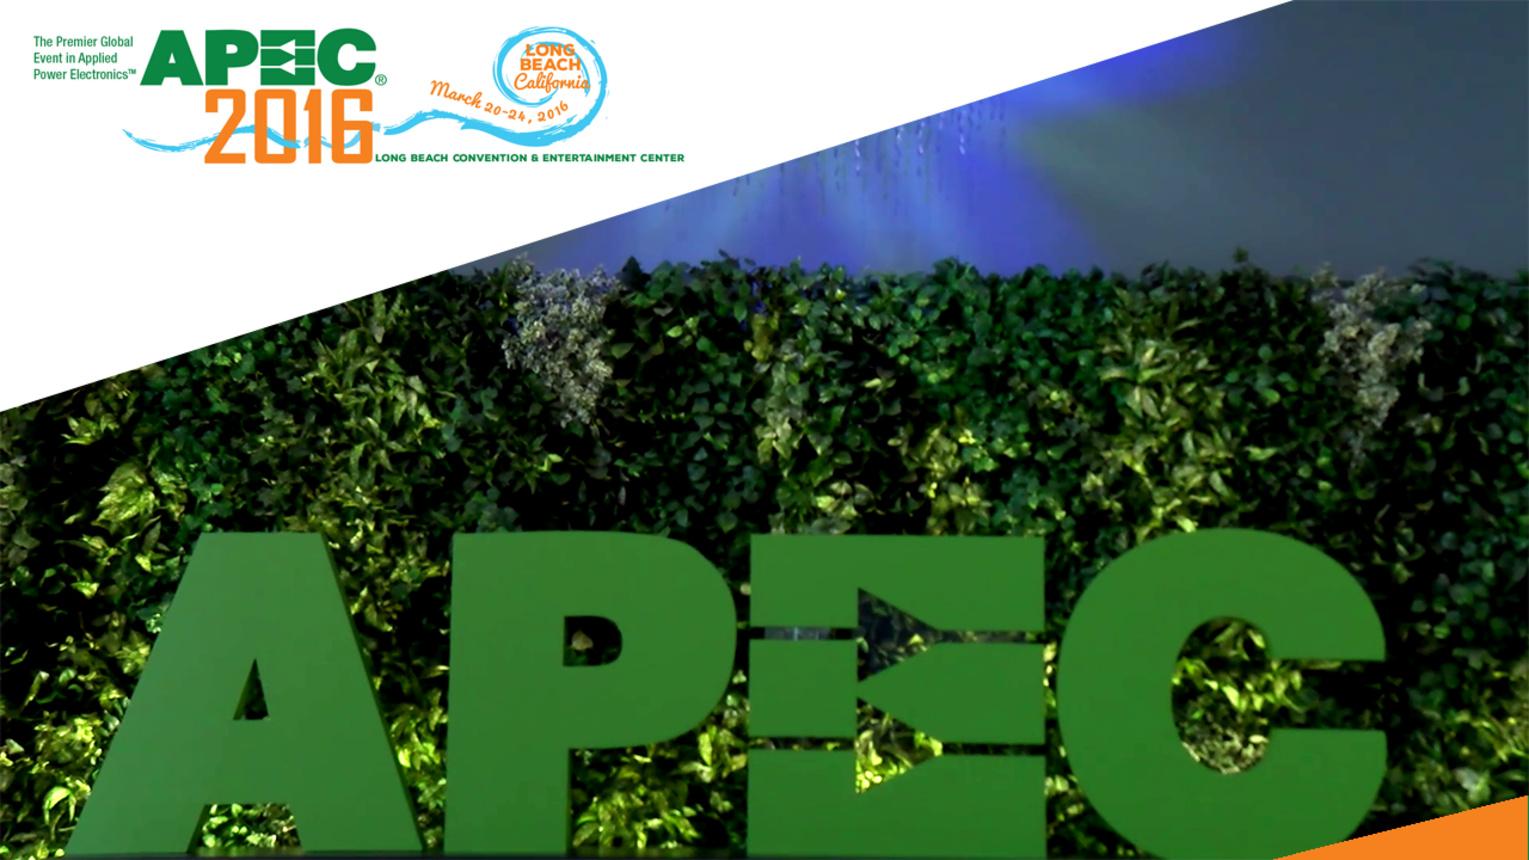 APEC 2016 at a Glance